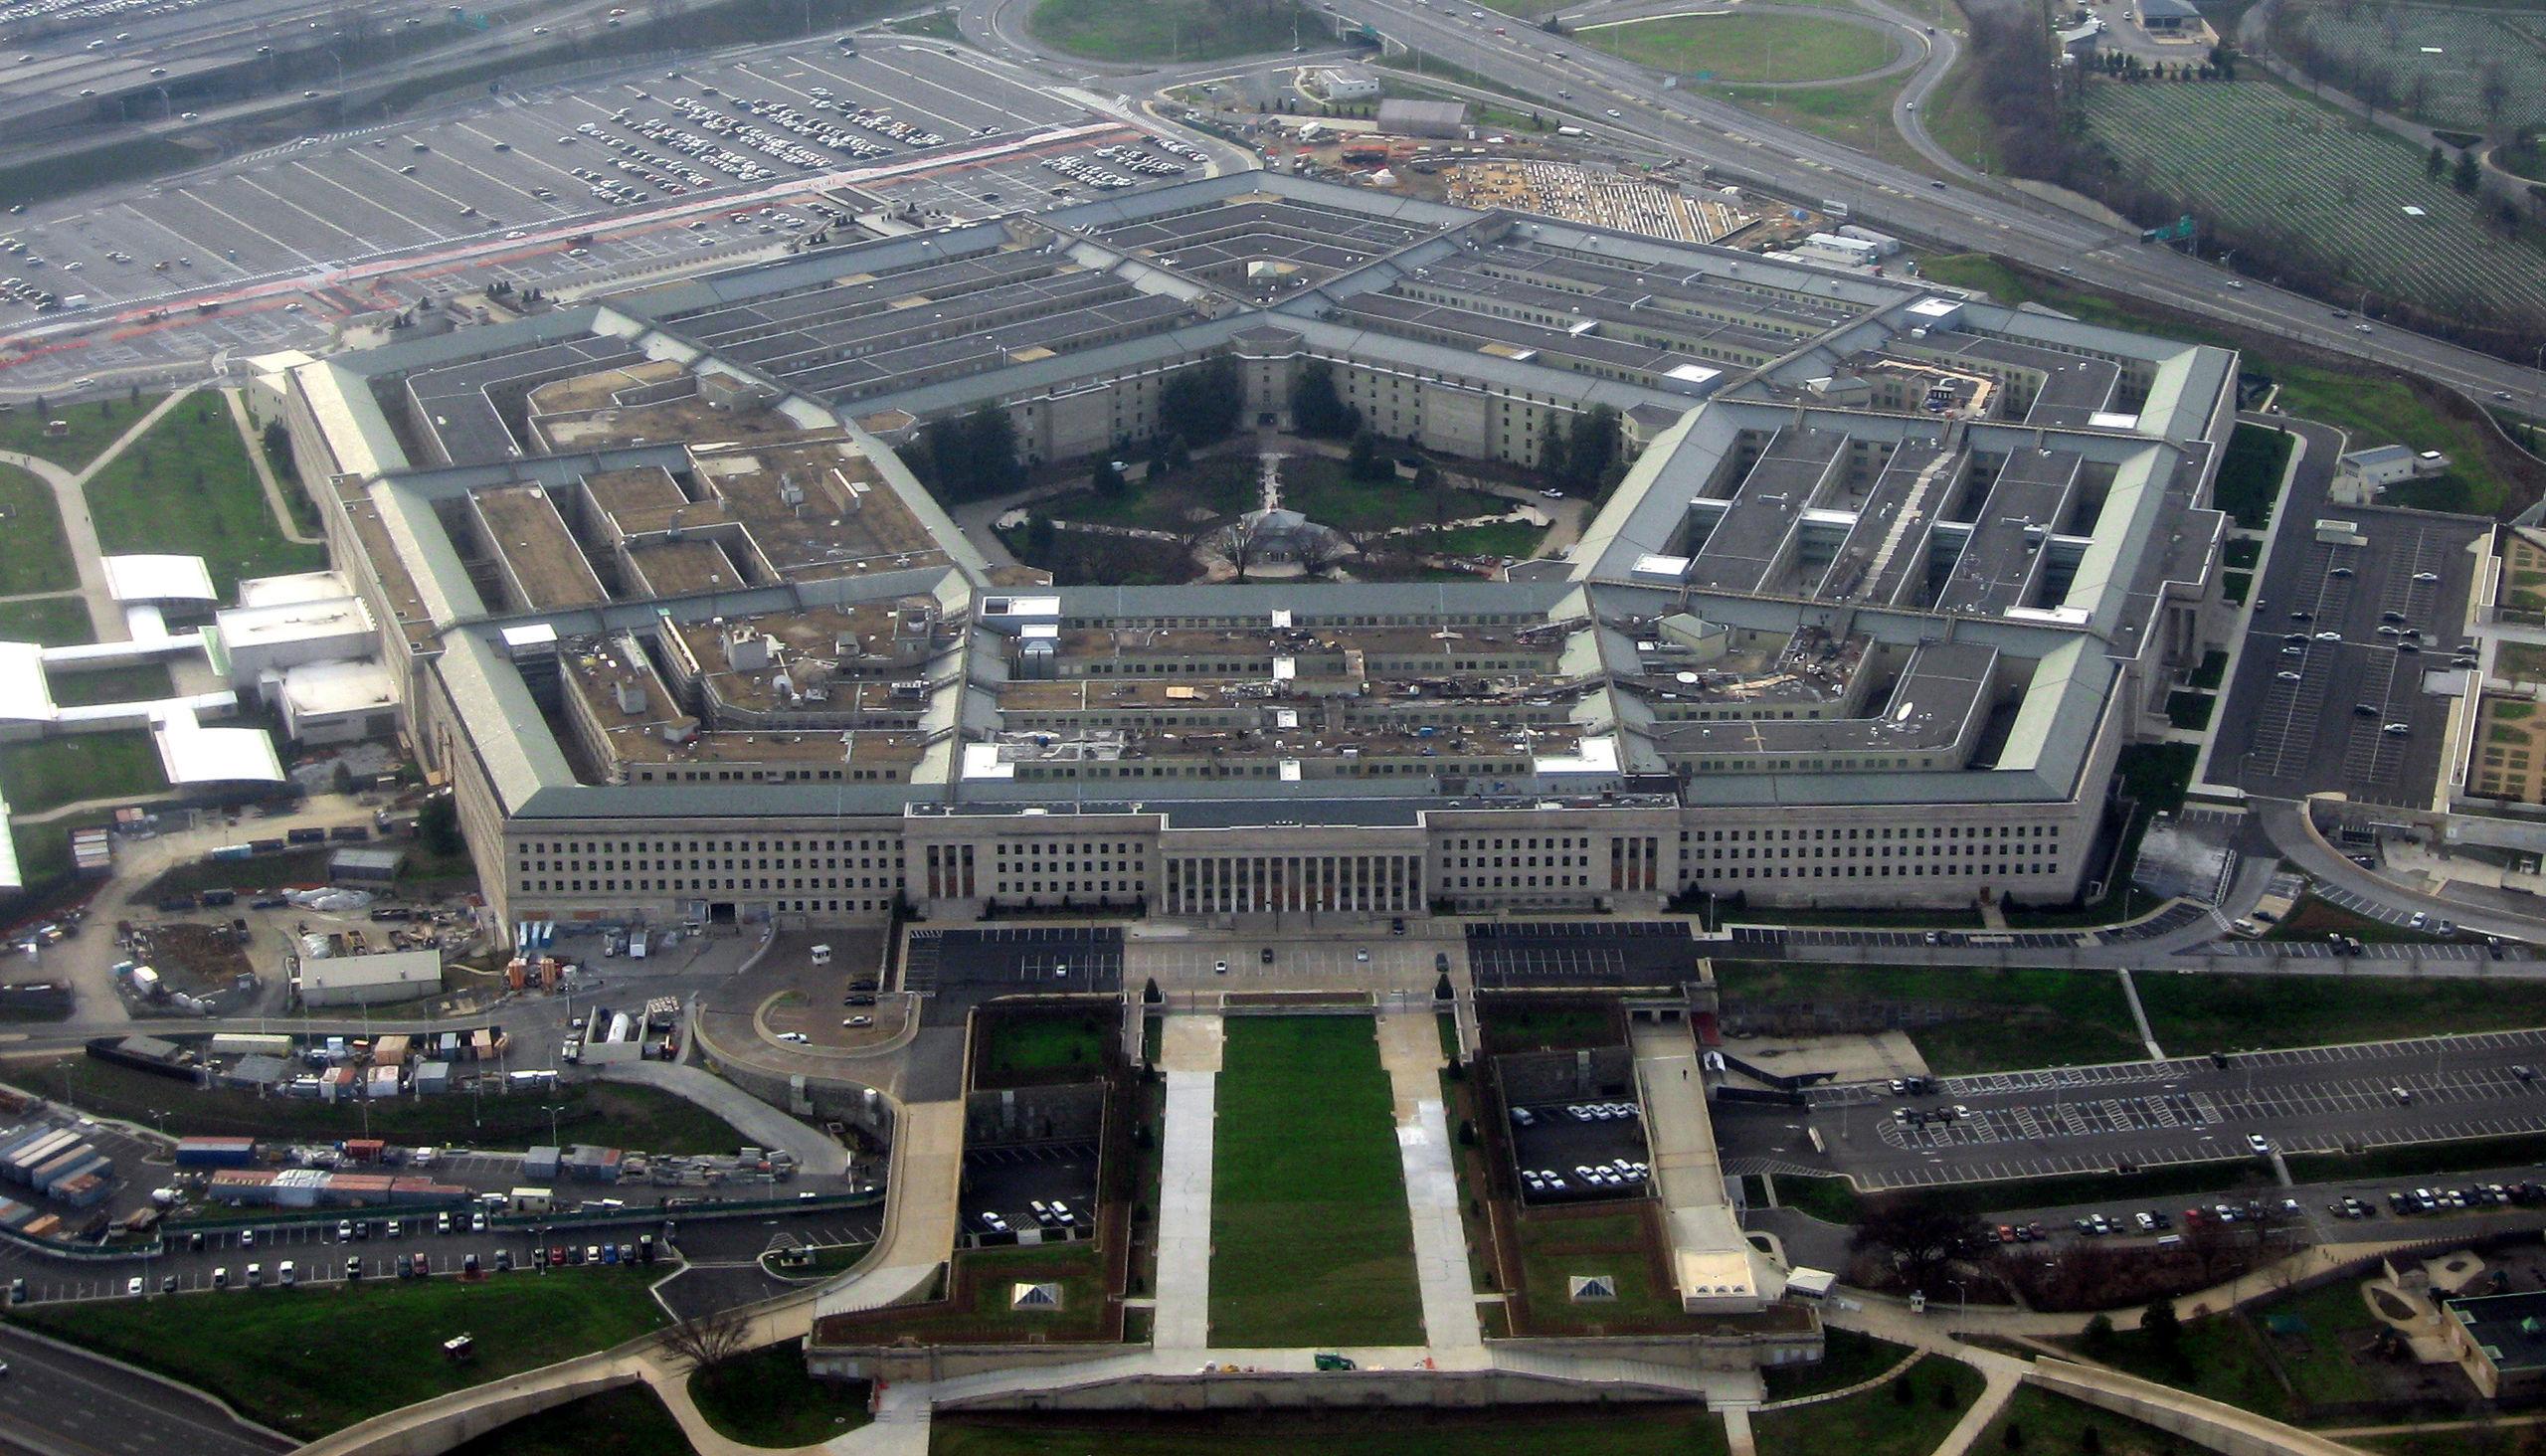 Analysis: Department of Defense, Third Largest Polluter of American Waterways